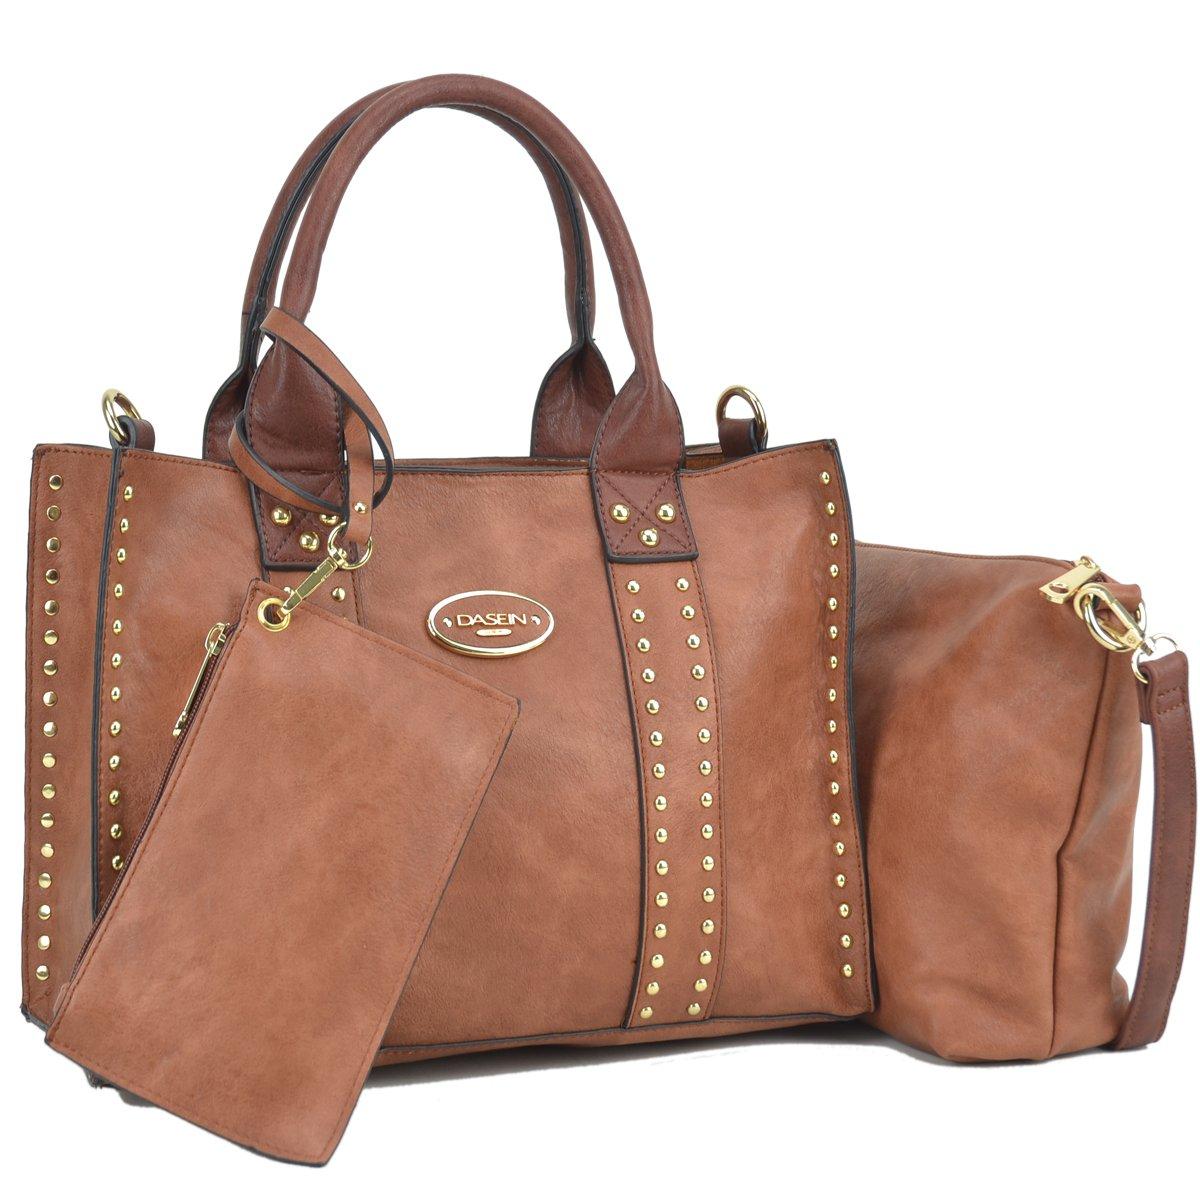 Women Vegan Leather Handbags Fashion Satchel Bags Shoulder Purses Top Handle Work Bags 3pcs Set Brown by Dasein